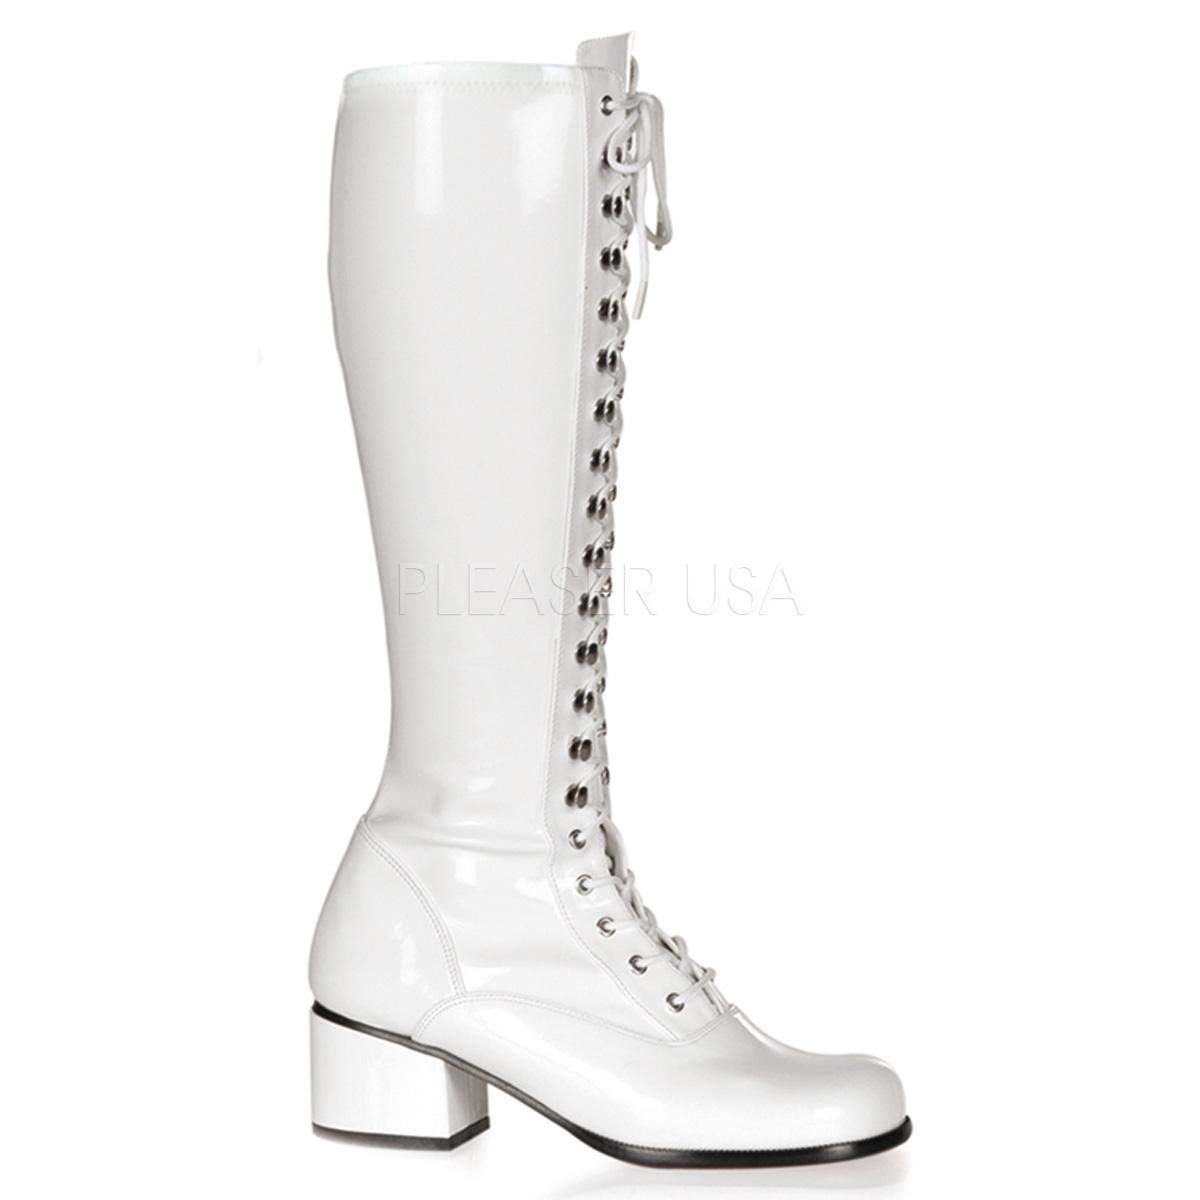 Funtasma(Pleaser) RETRO-302 レースアップ(編み上げ)/サイドジップ ニーハイブーツ エナメル白 ひざ下丈ブーツ 約5cmブロックヒール◆取り寄せ